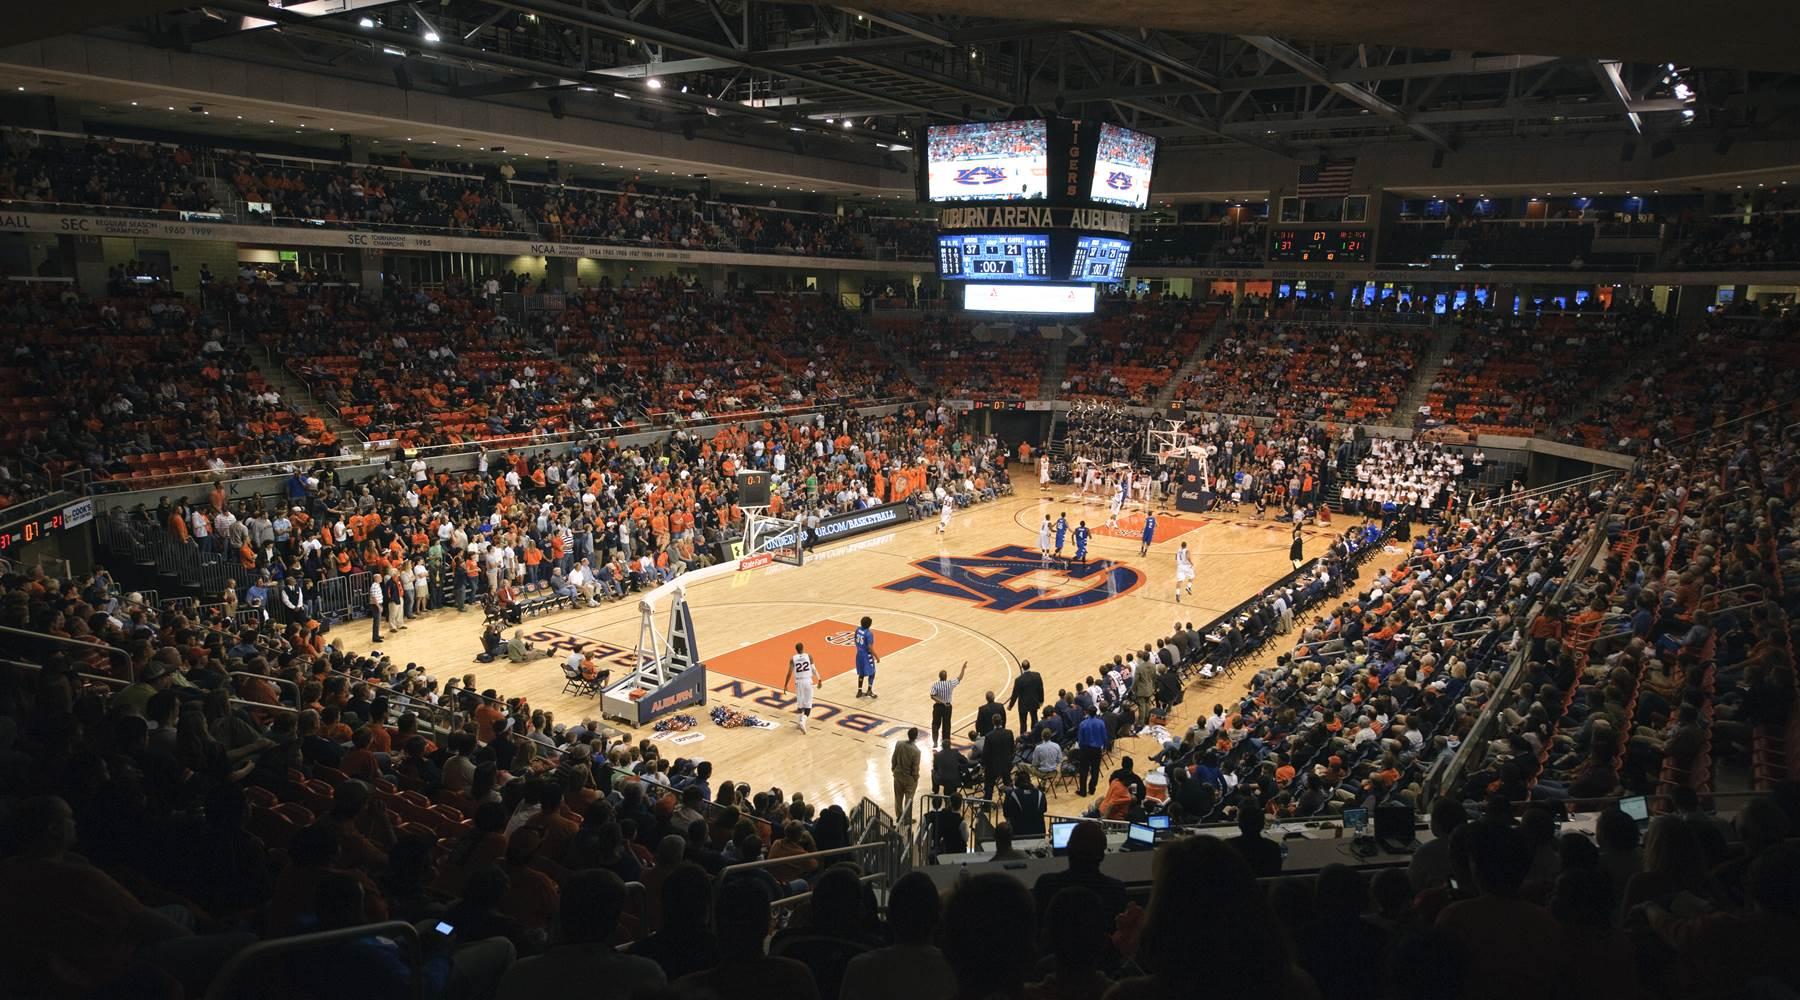 Basketball game at Auburn Arena